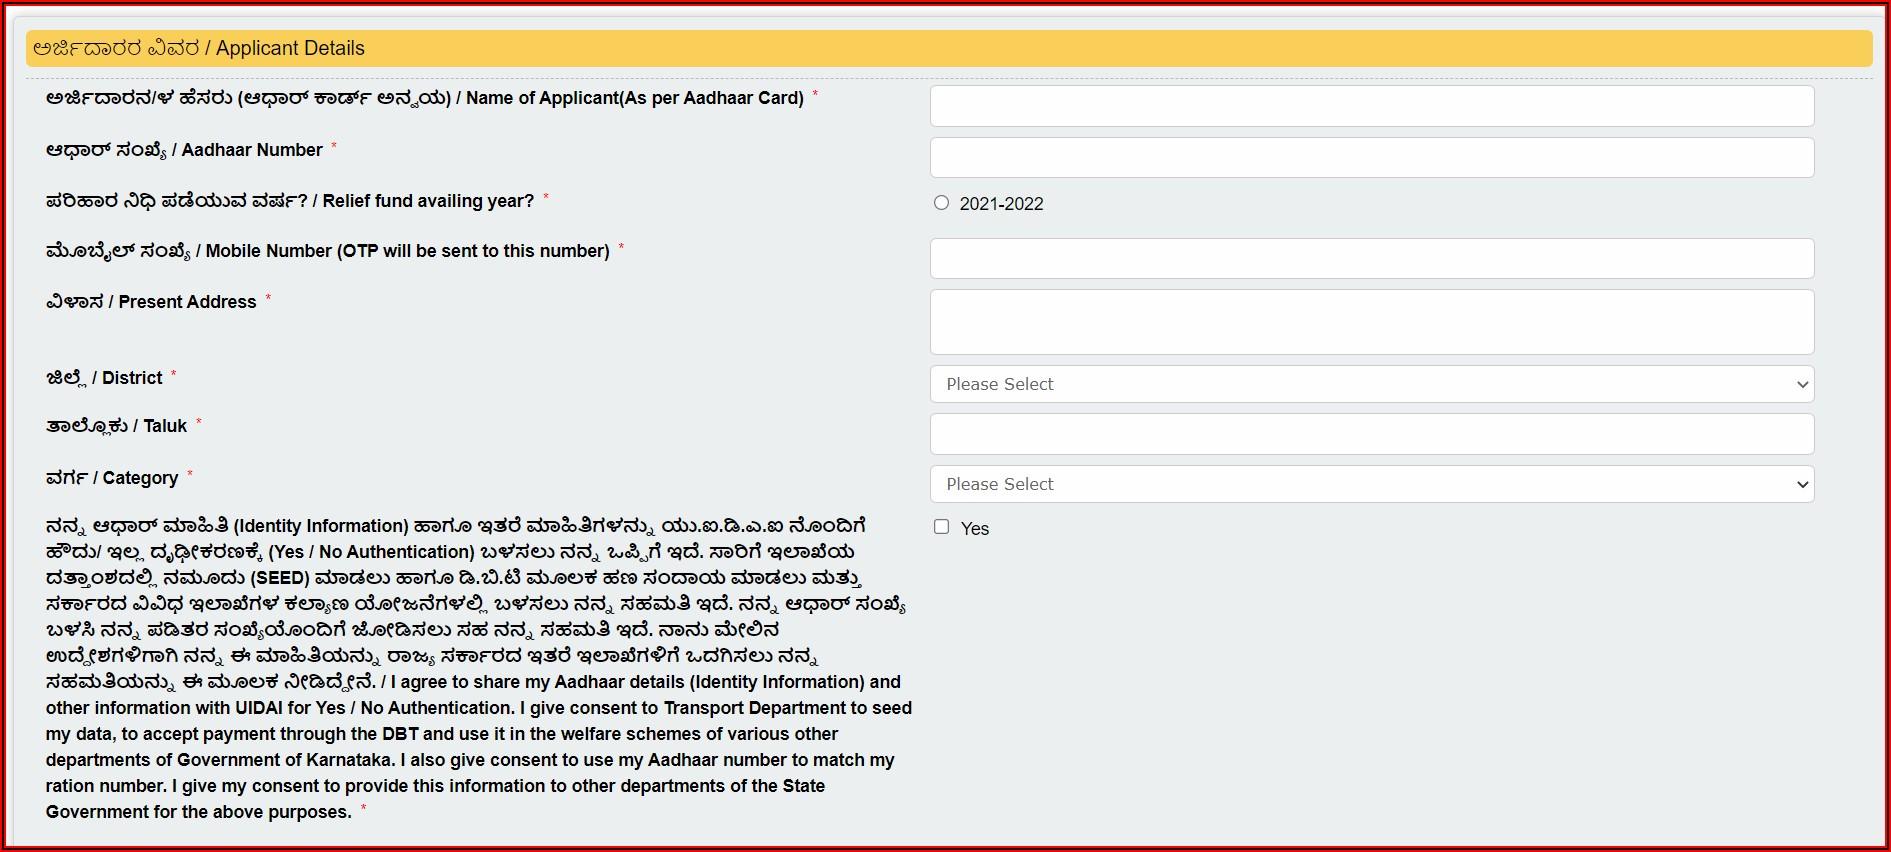 Taxi Driver 5000 Application Form